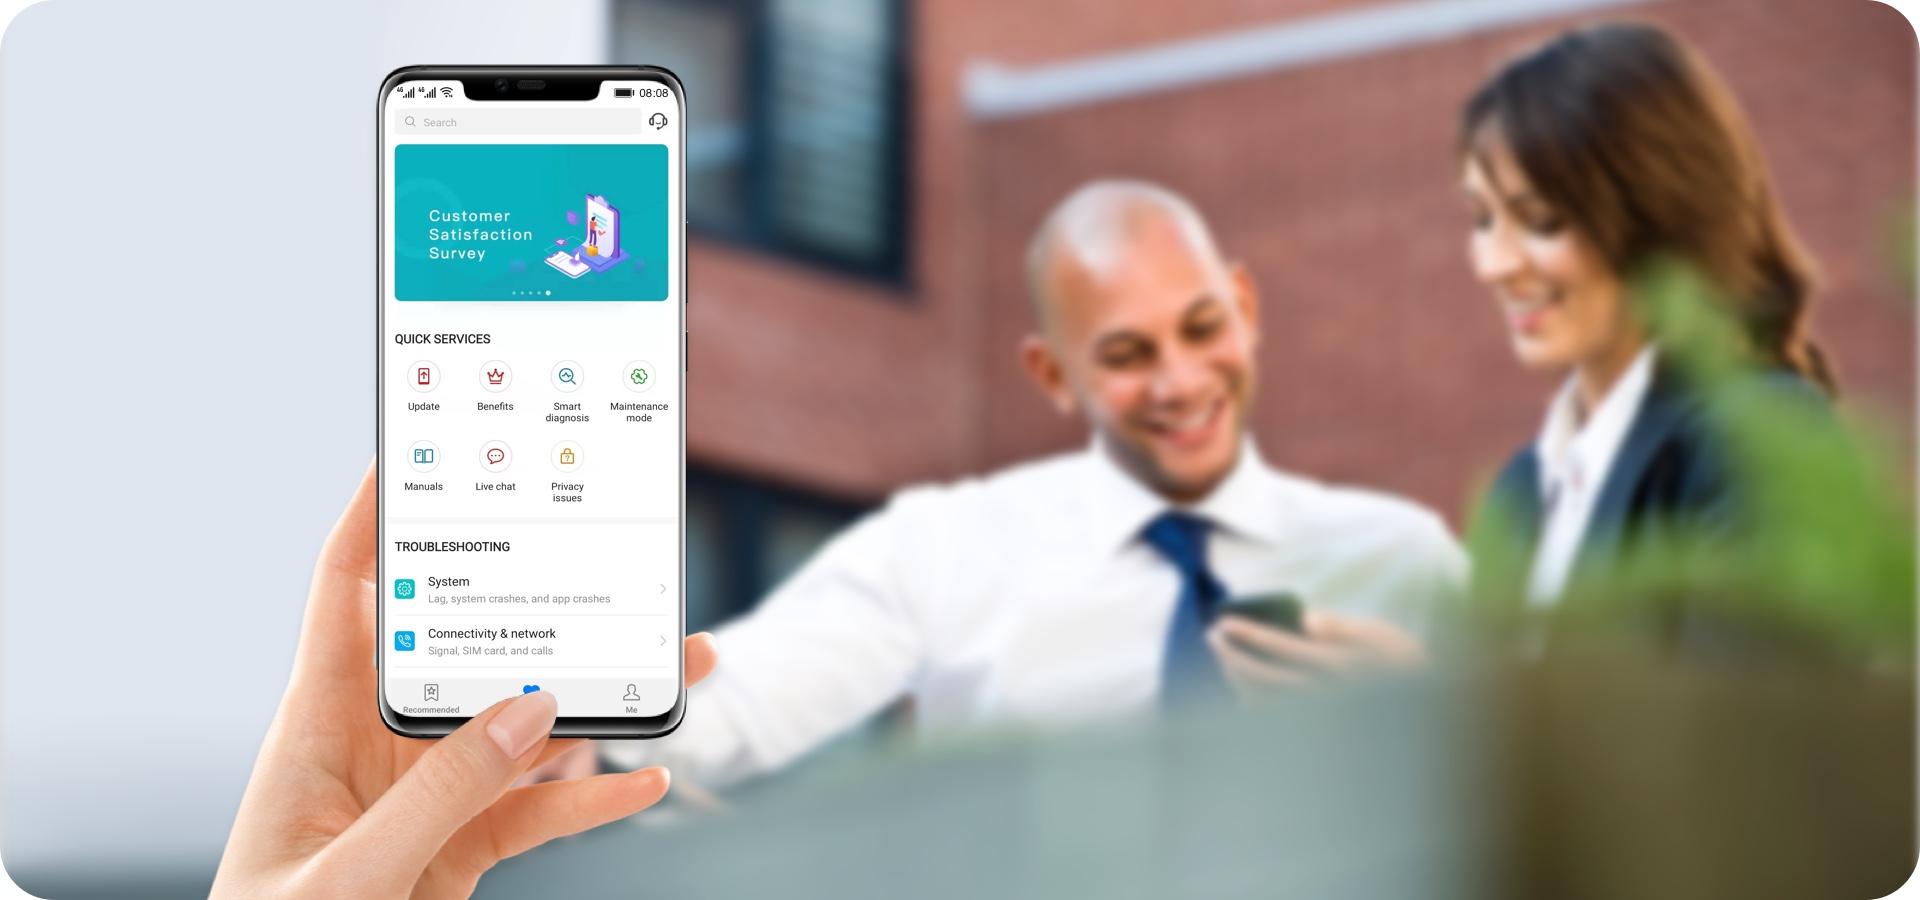 GPS dating app UK εγγραφή γνωριμιών σε απευθείας σύνδεση